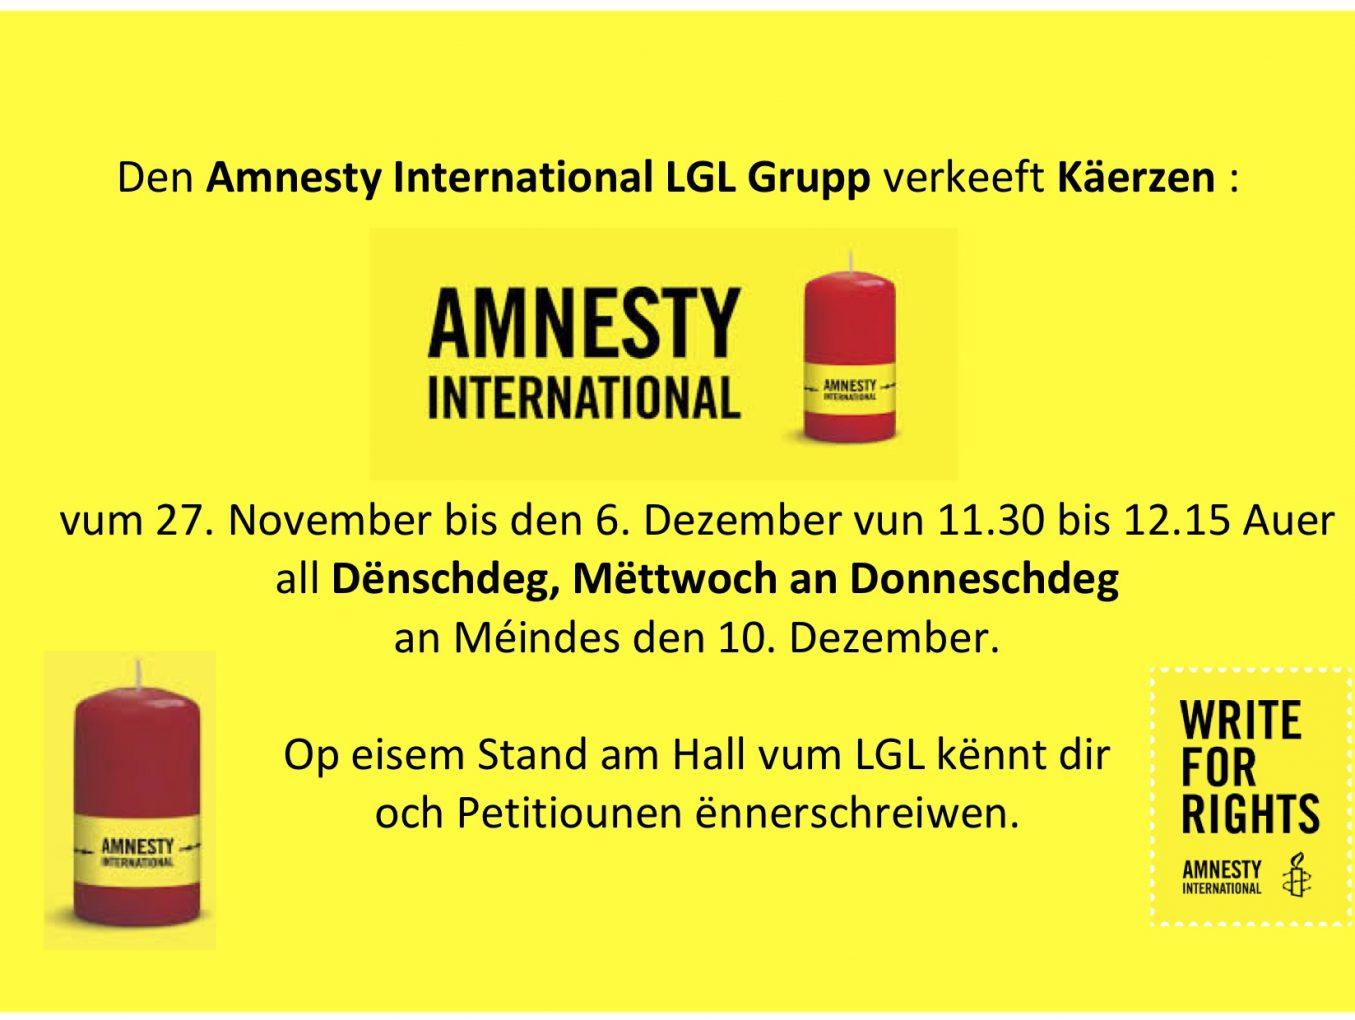 LGL Grupp Amnesty International